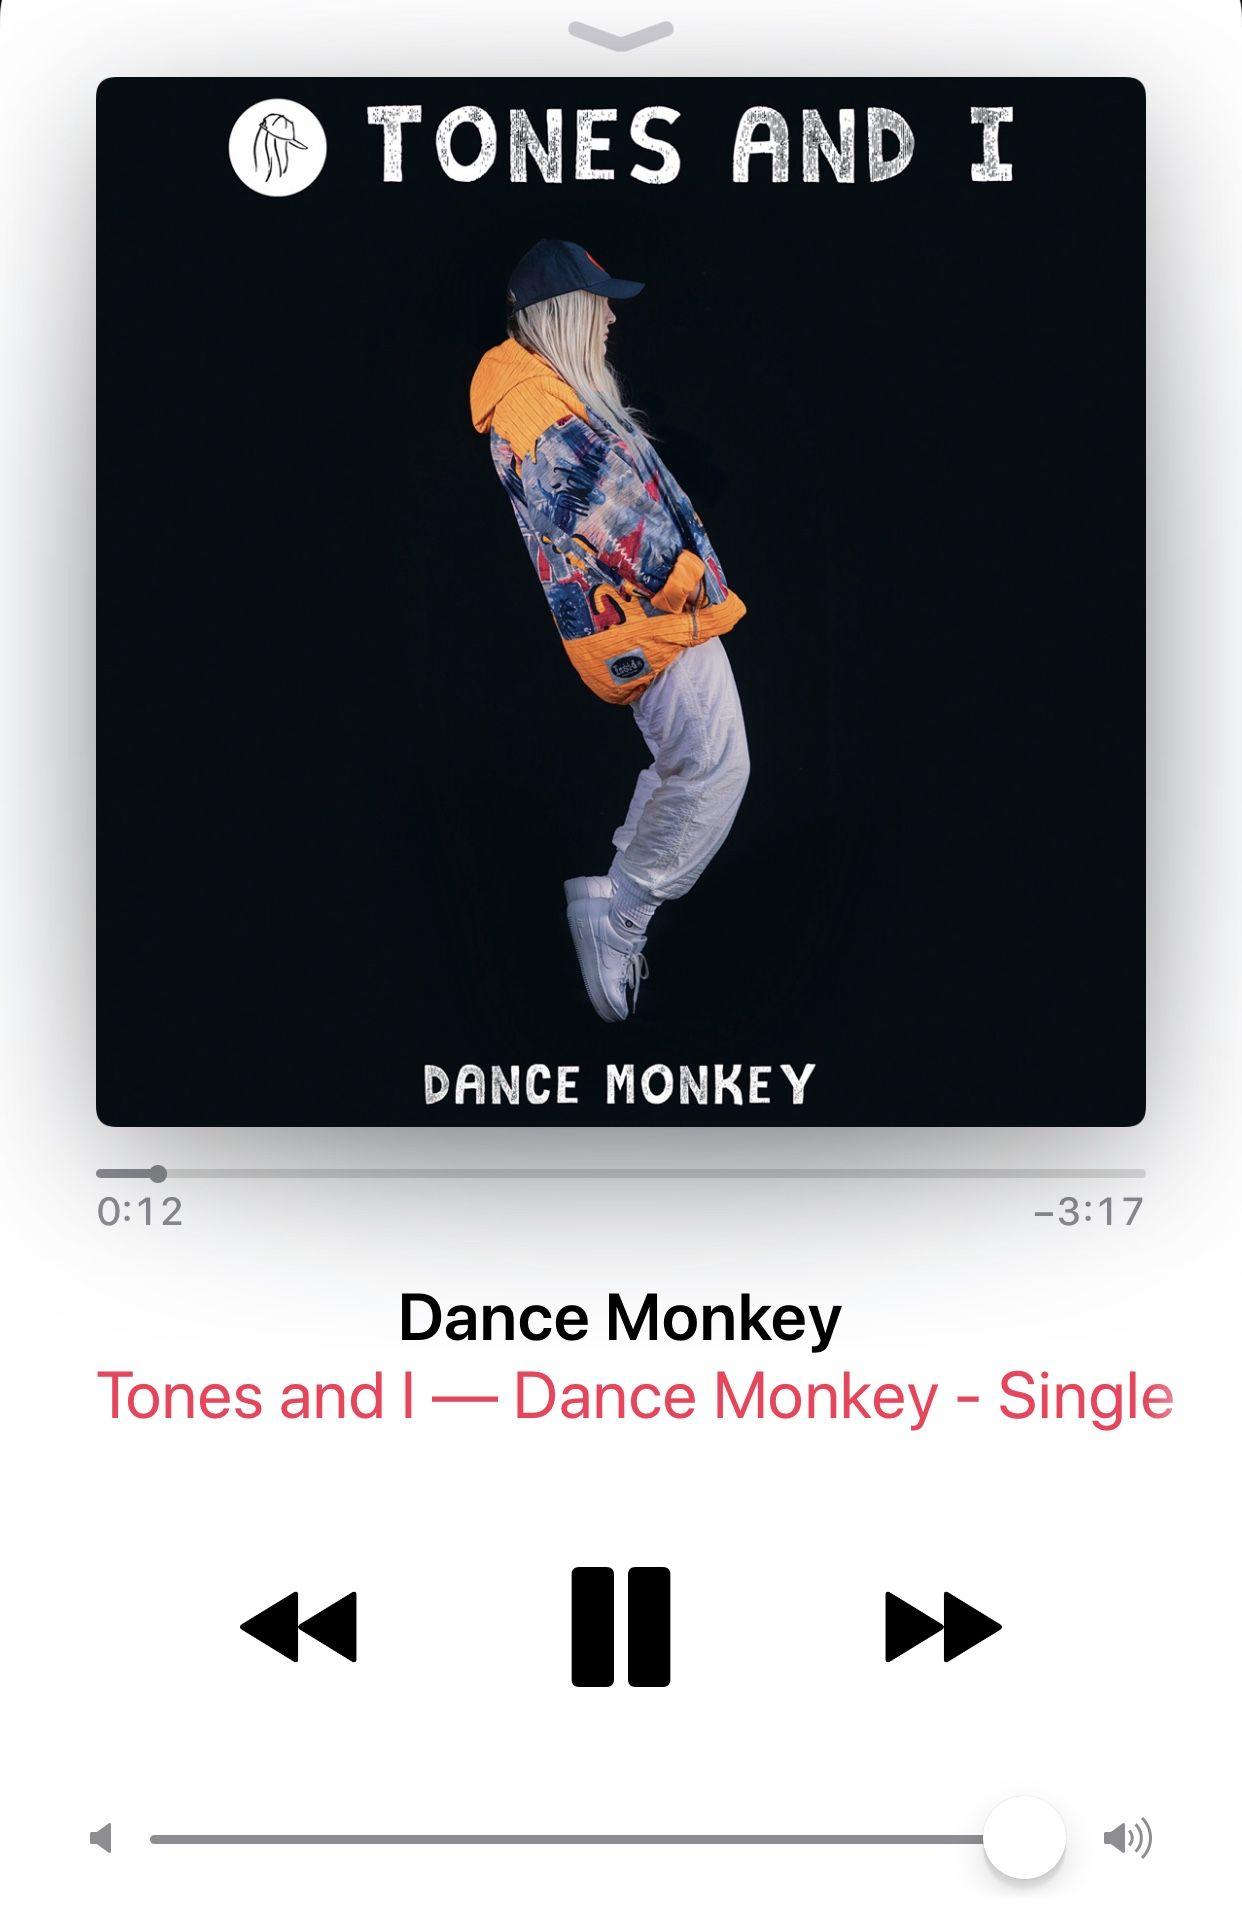 Tones And I Dance Monkey Music Video Song Youtube Videos Music Music Lyrics Songs